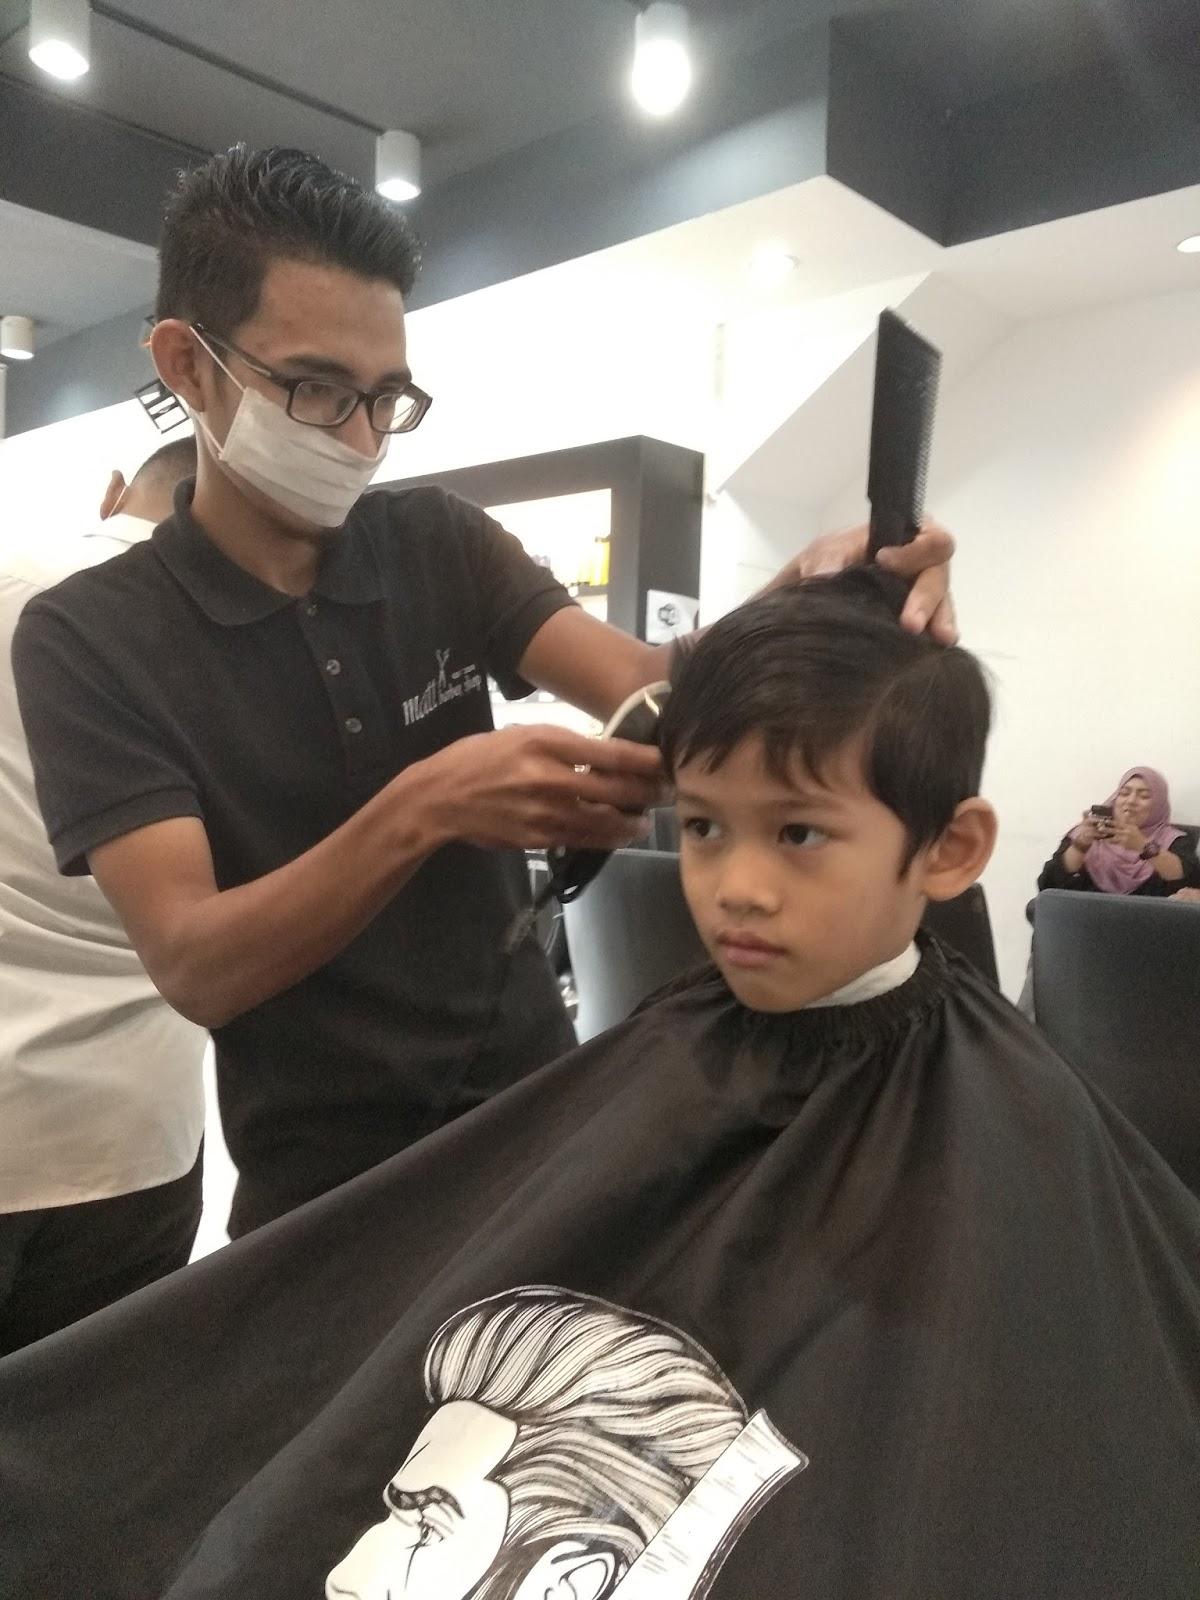 Pertama kali The Arifs potong rambut di Matt Barber Shop